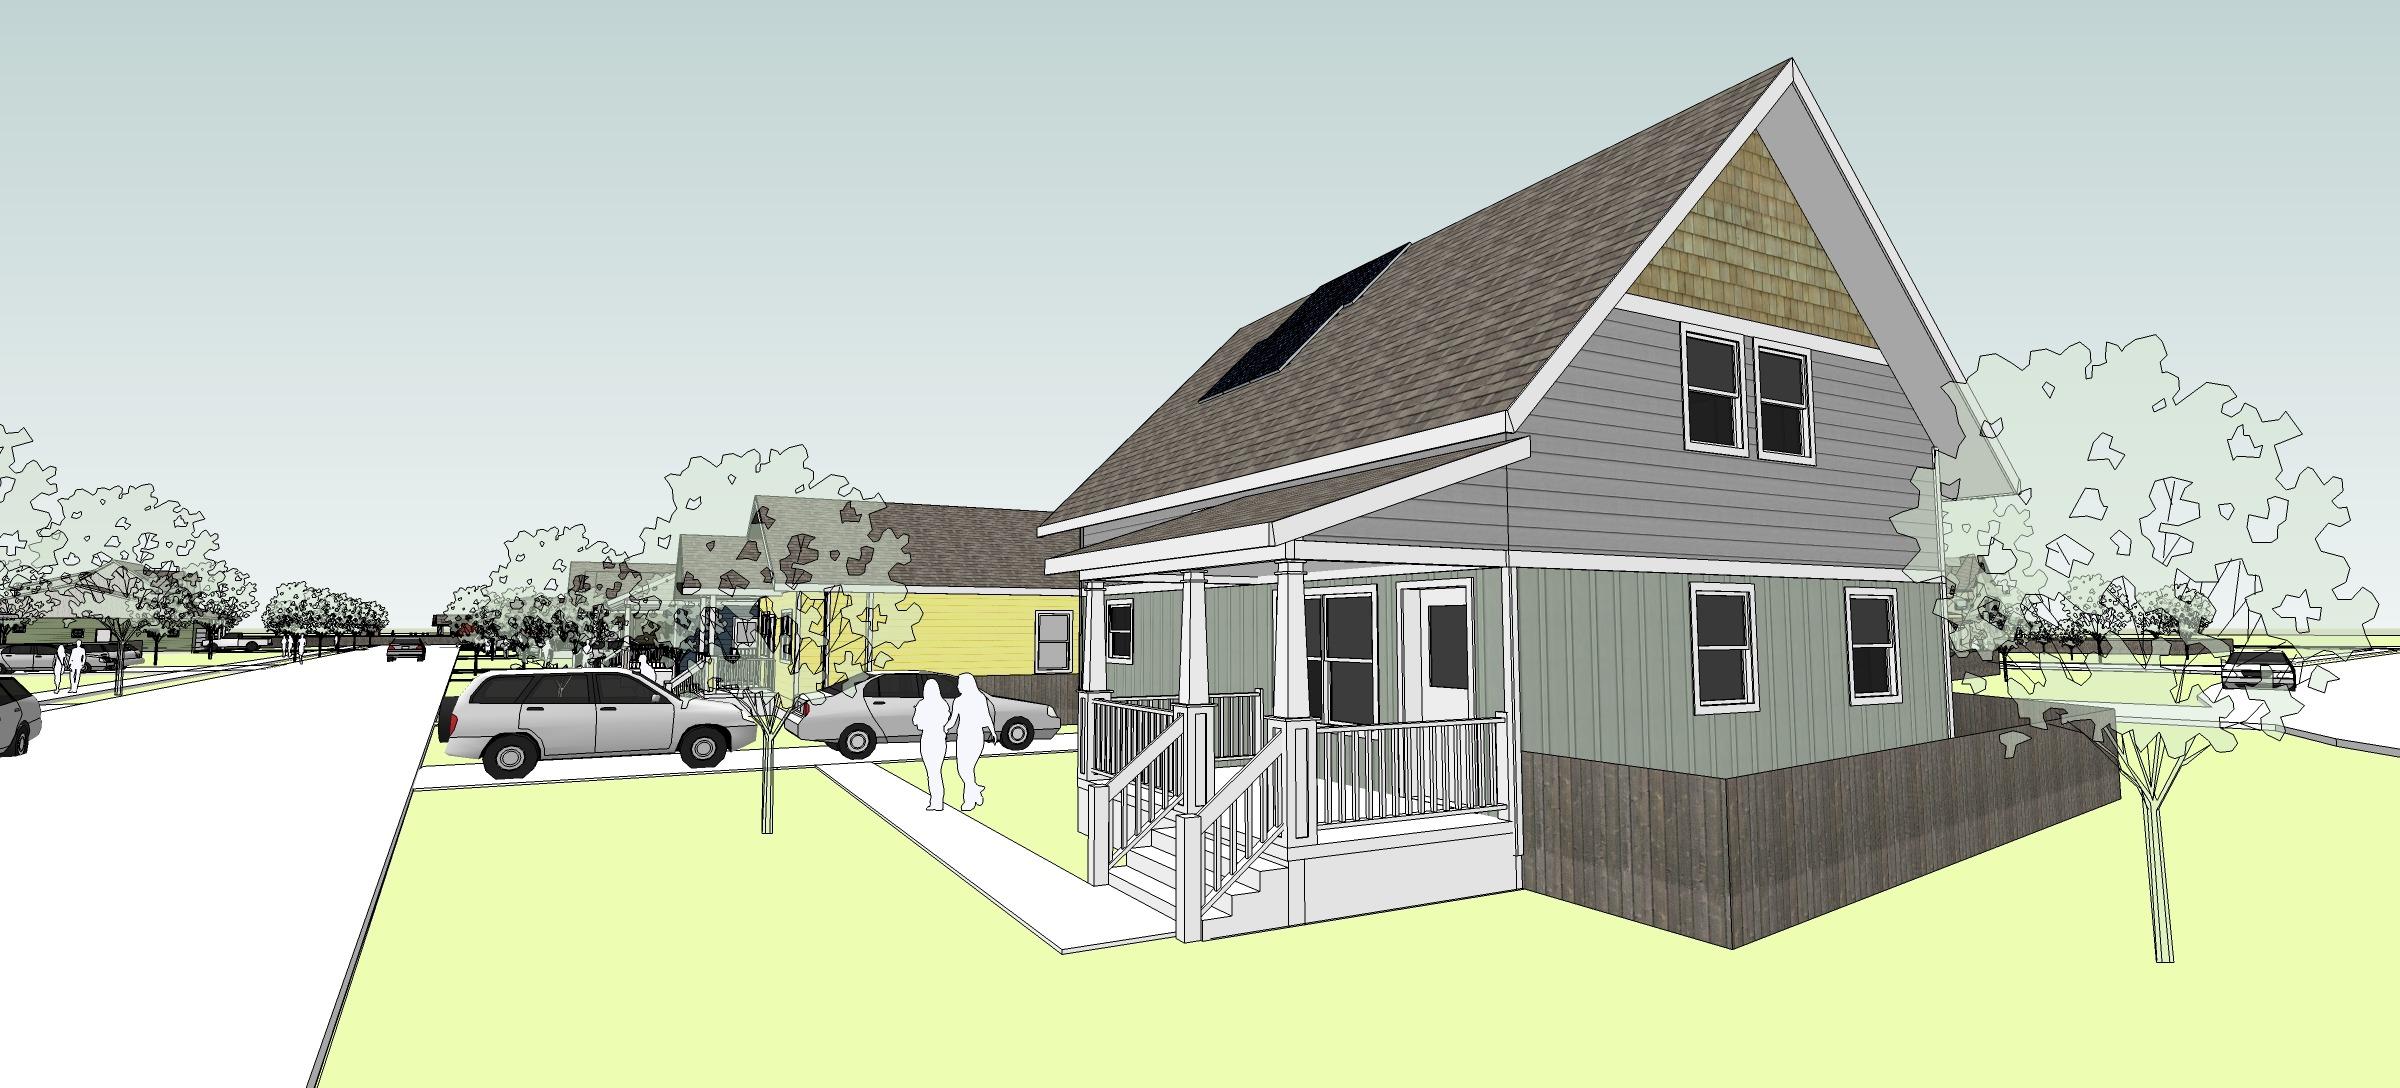 Dayton House Plan   National Affordable Housing NetworkDayton House Plan